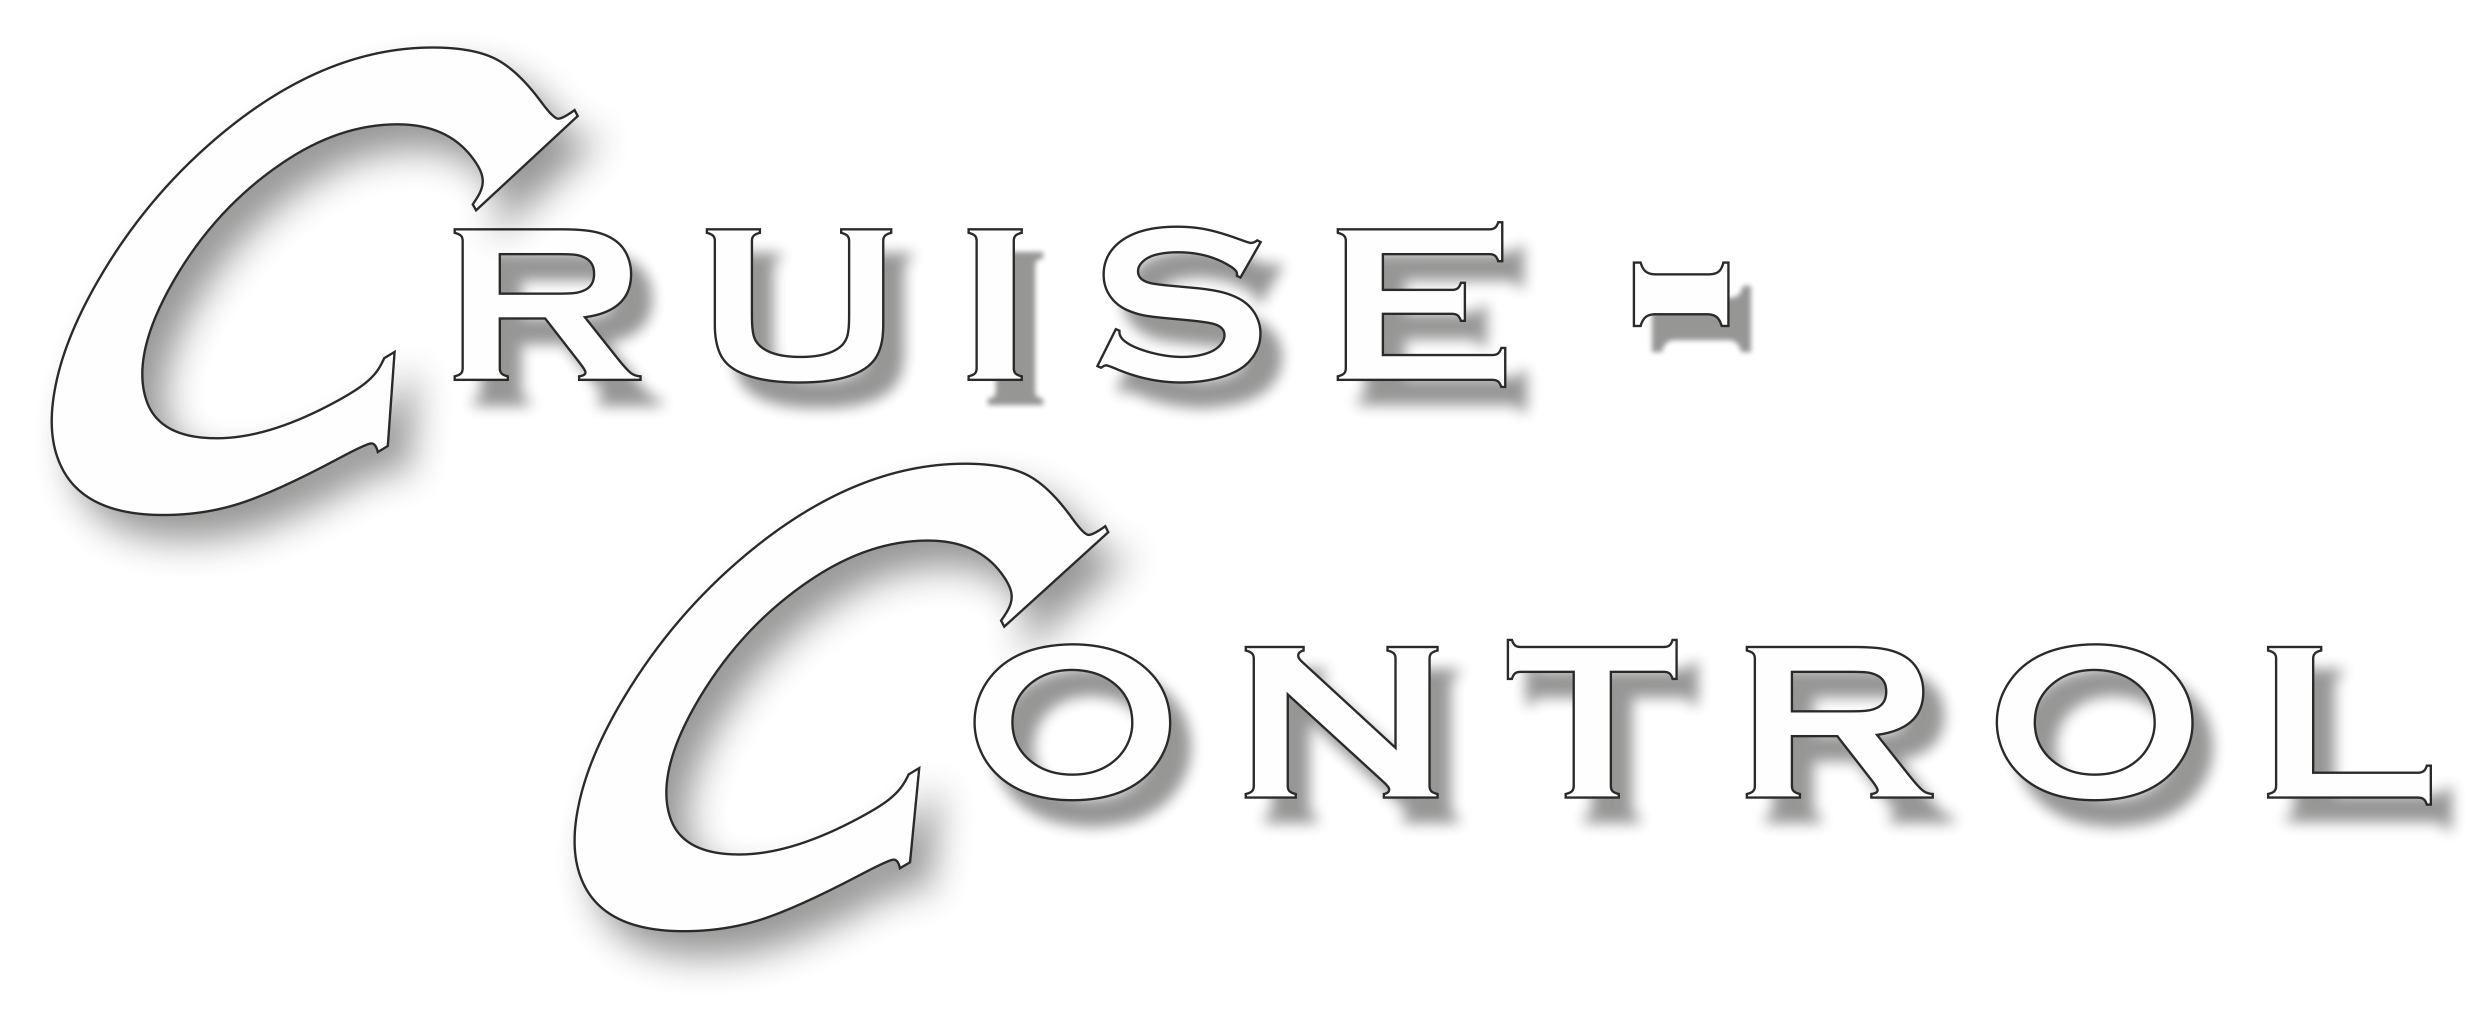 Fahrschule Cruise-Control